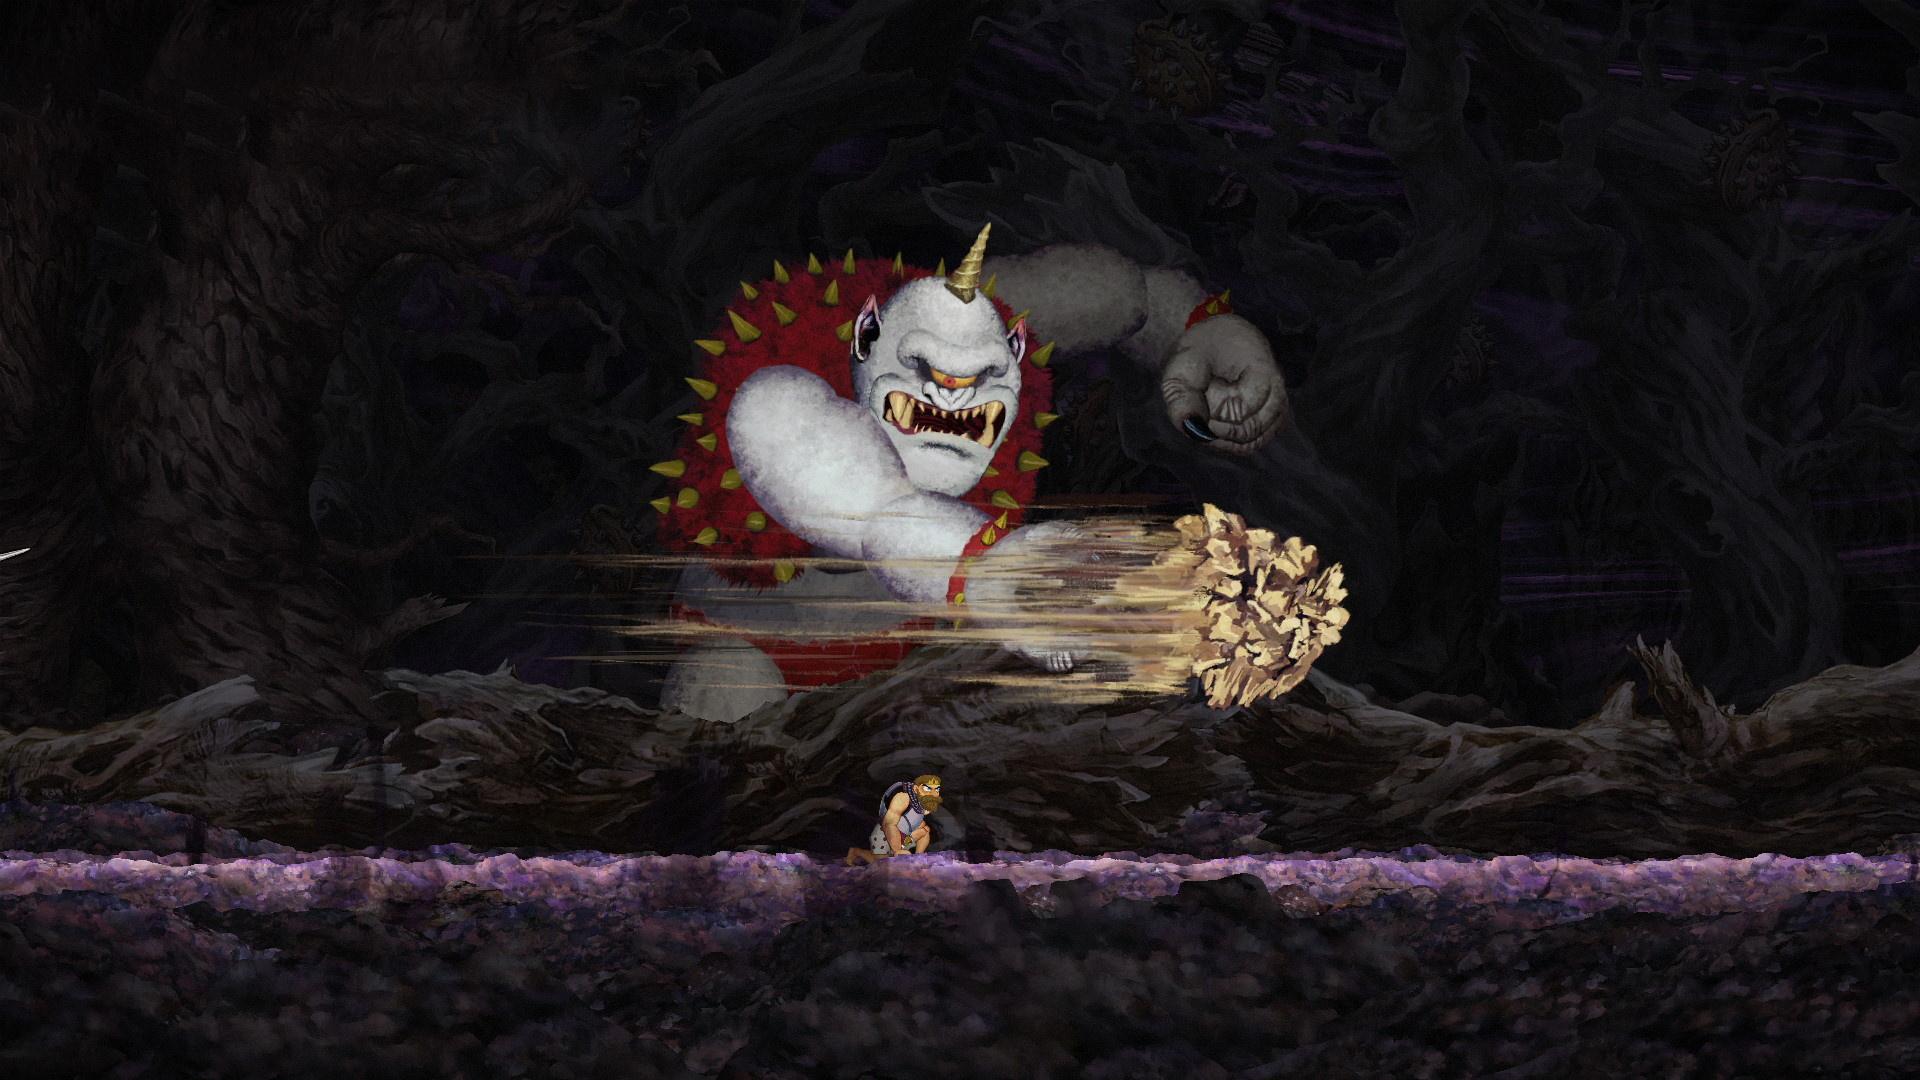 Ghosts 'n Goblins Resurrection выйдет на PS4, Xbox One и PC